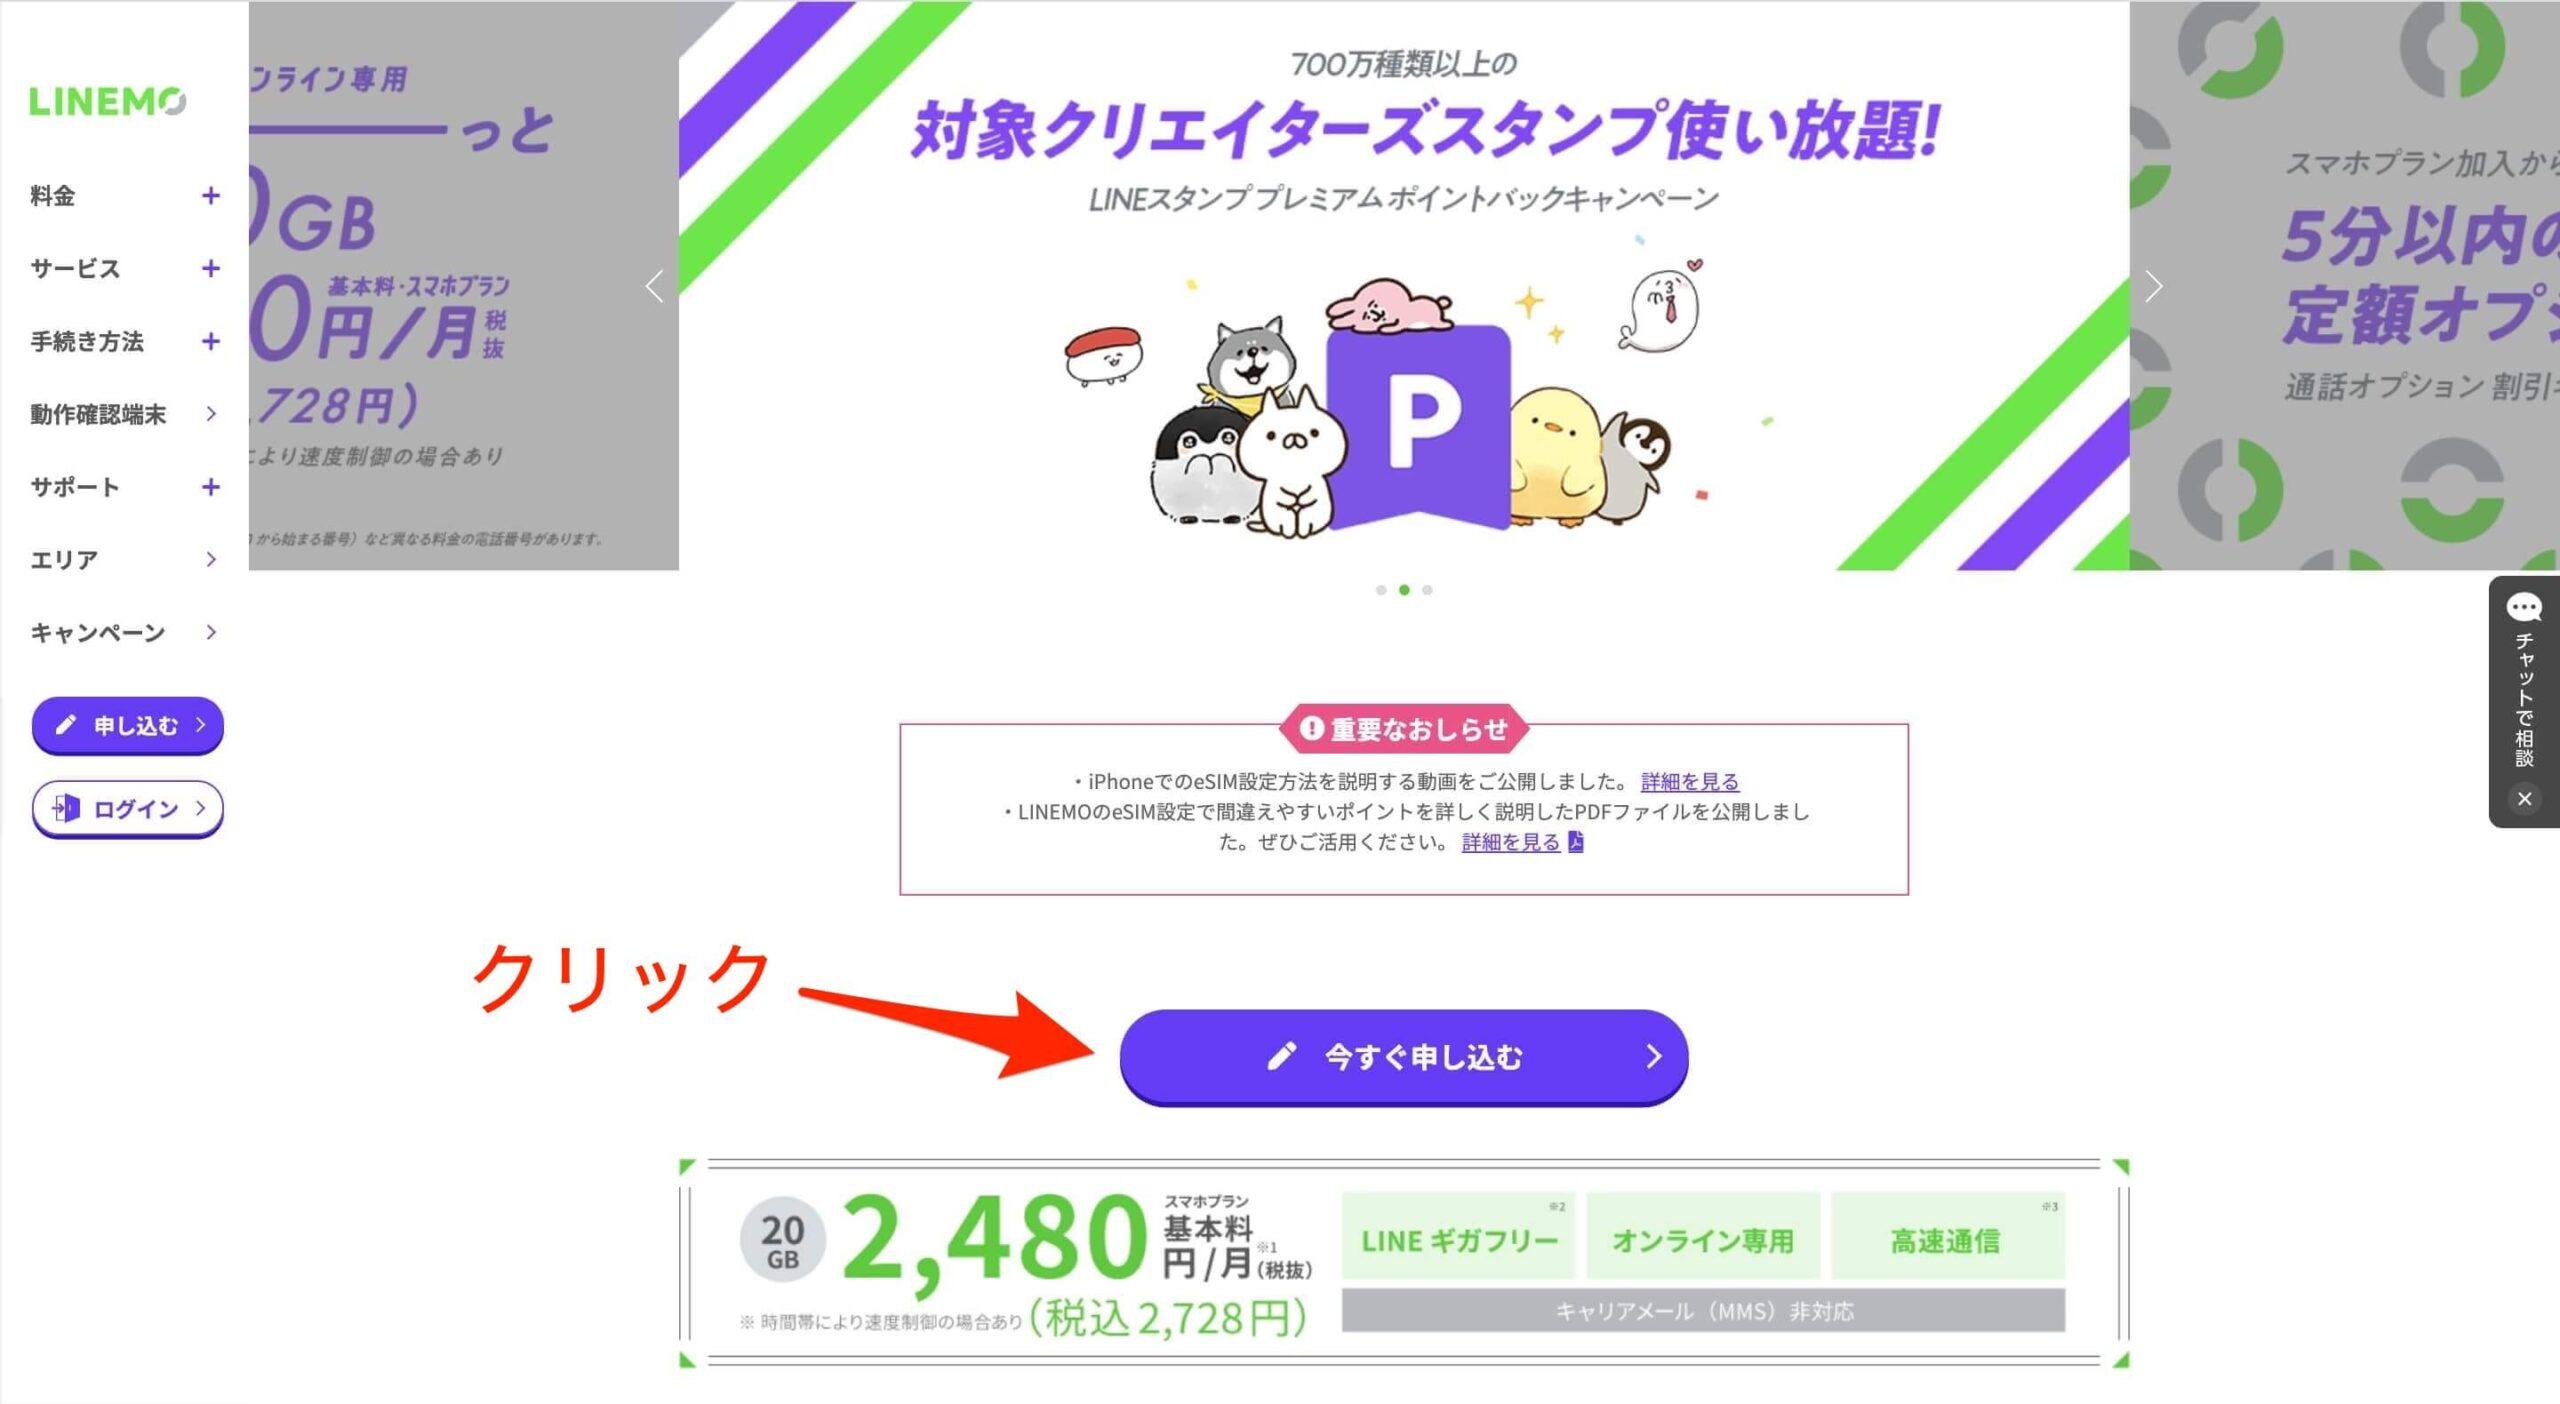 LINEMOのHPトップページ